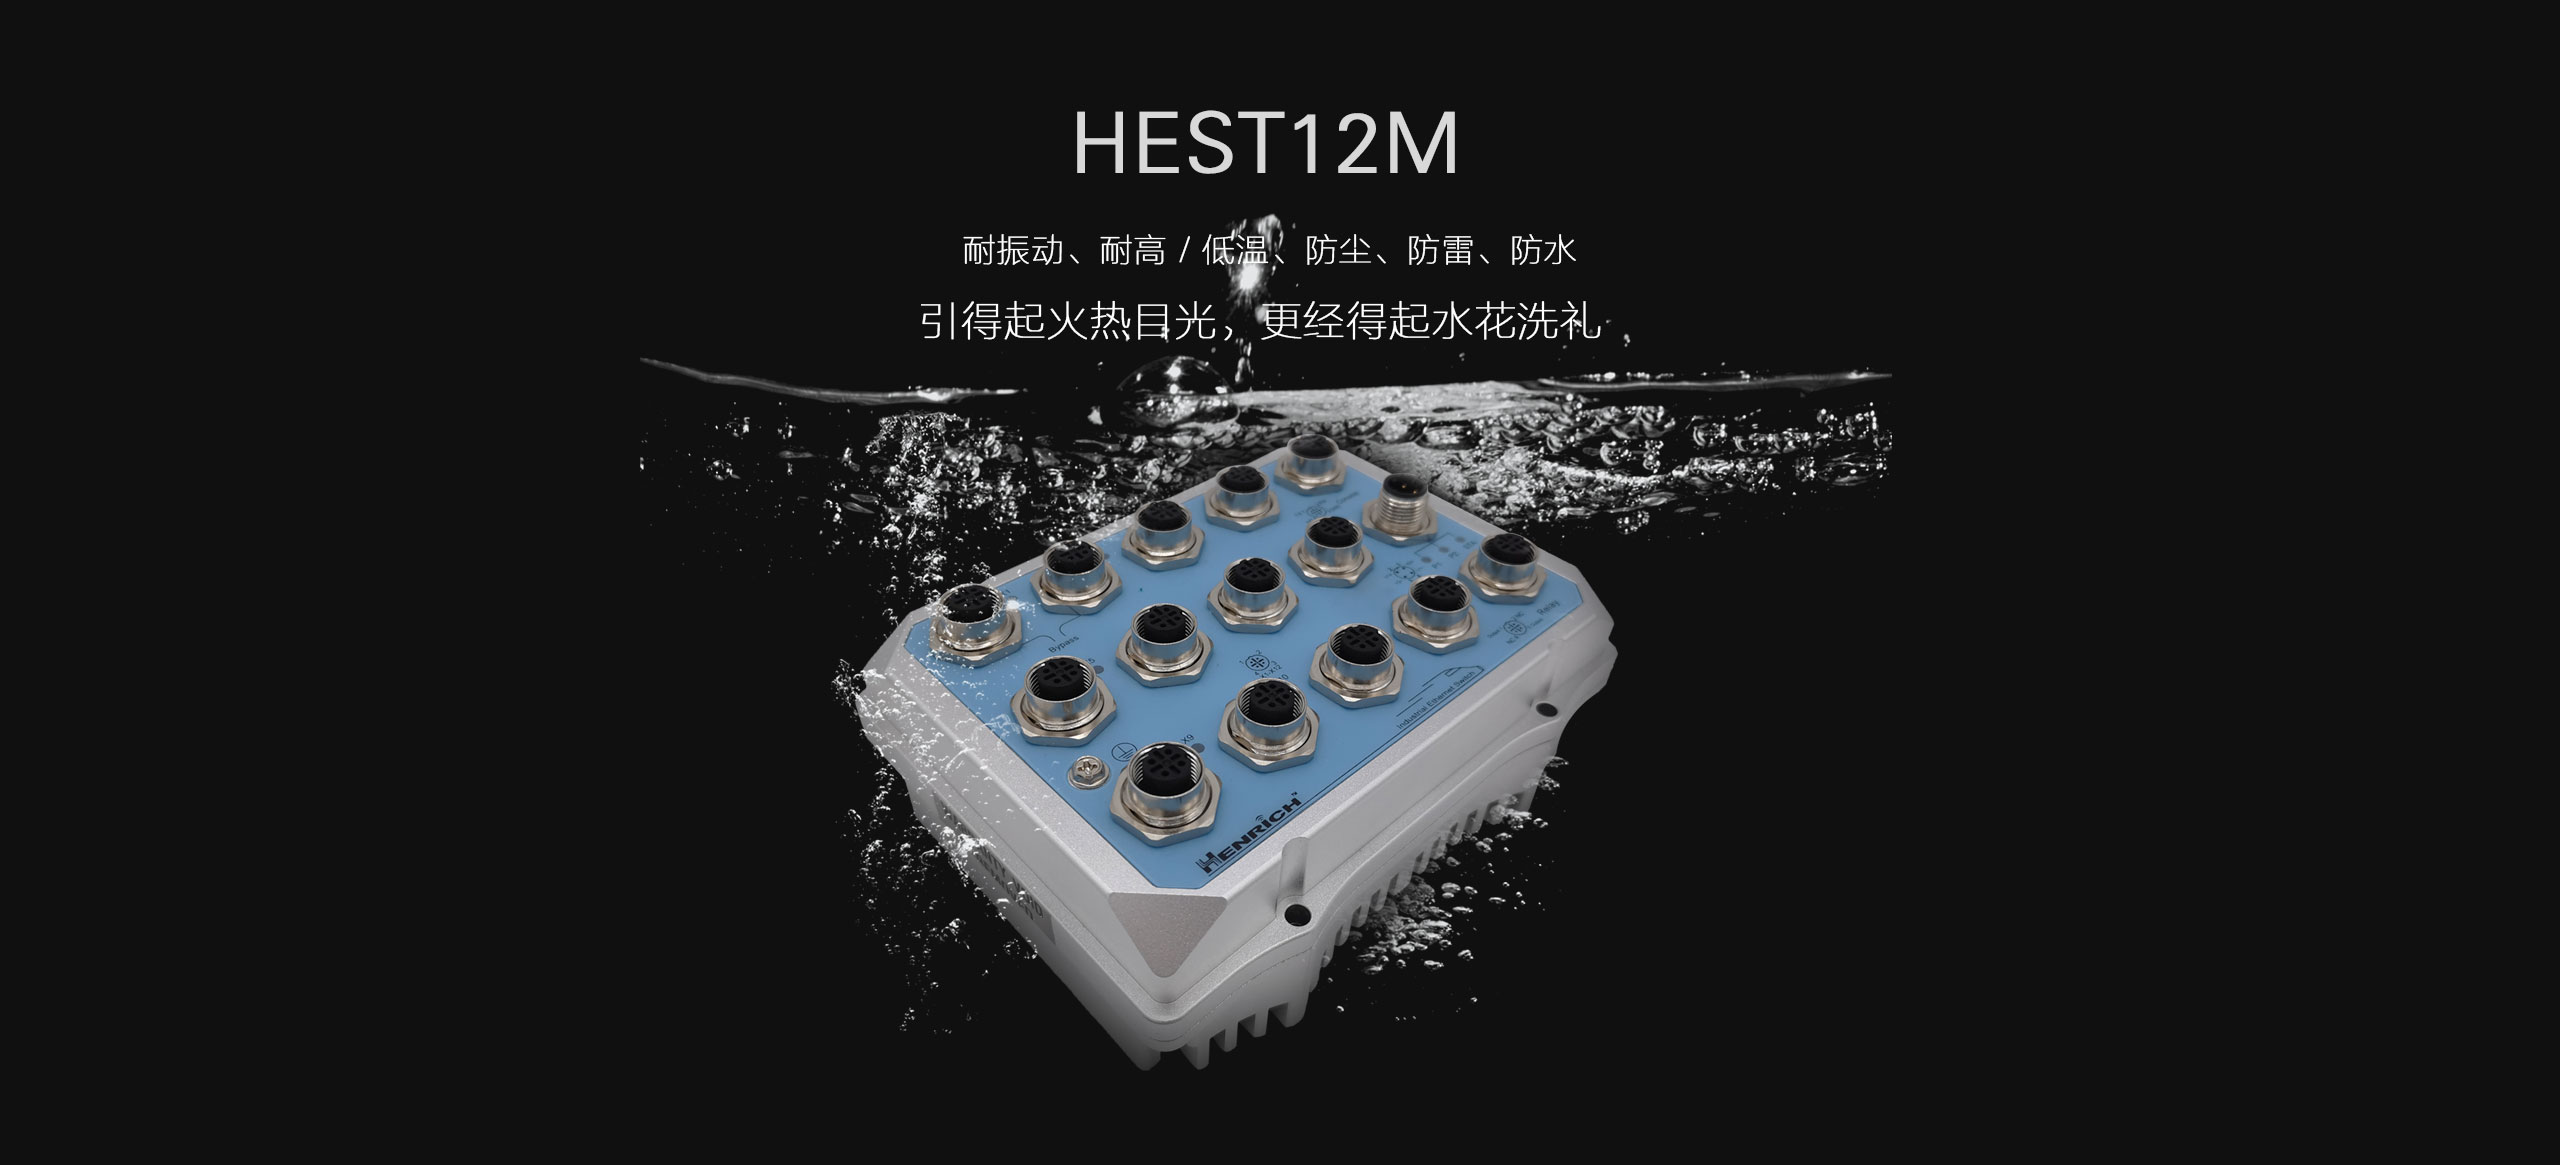 HEST12M 系(xi)列